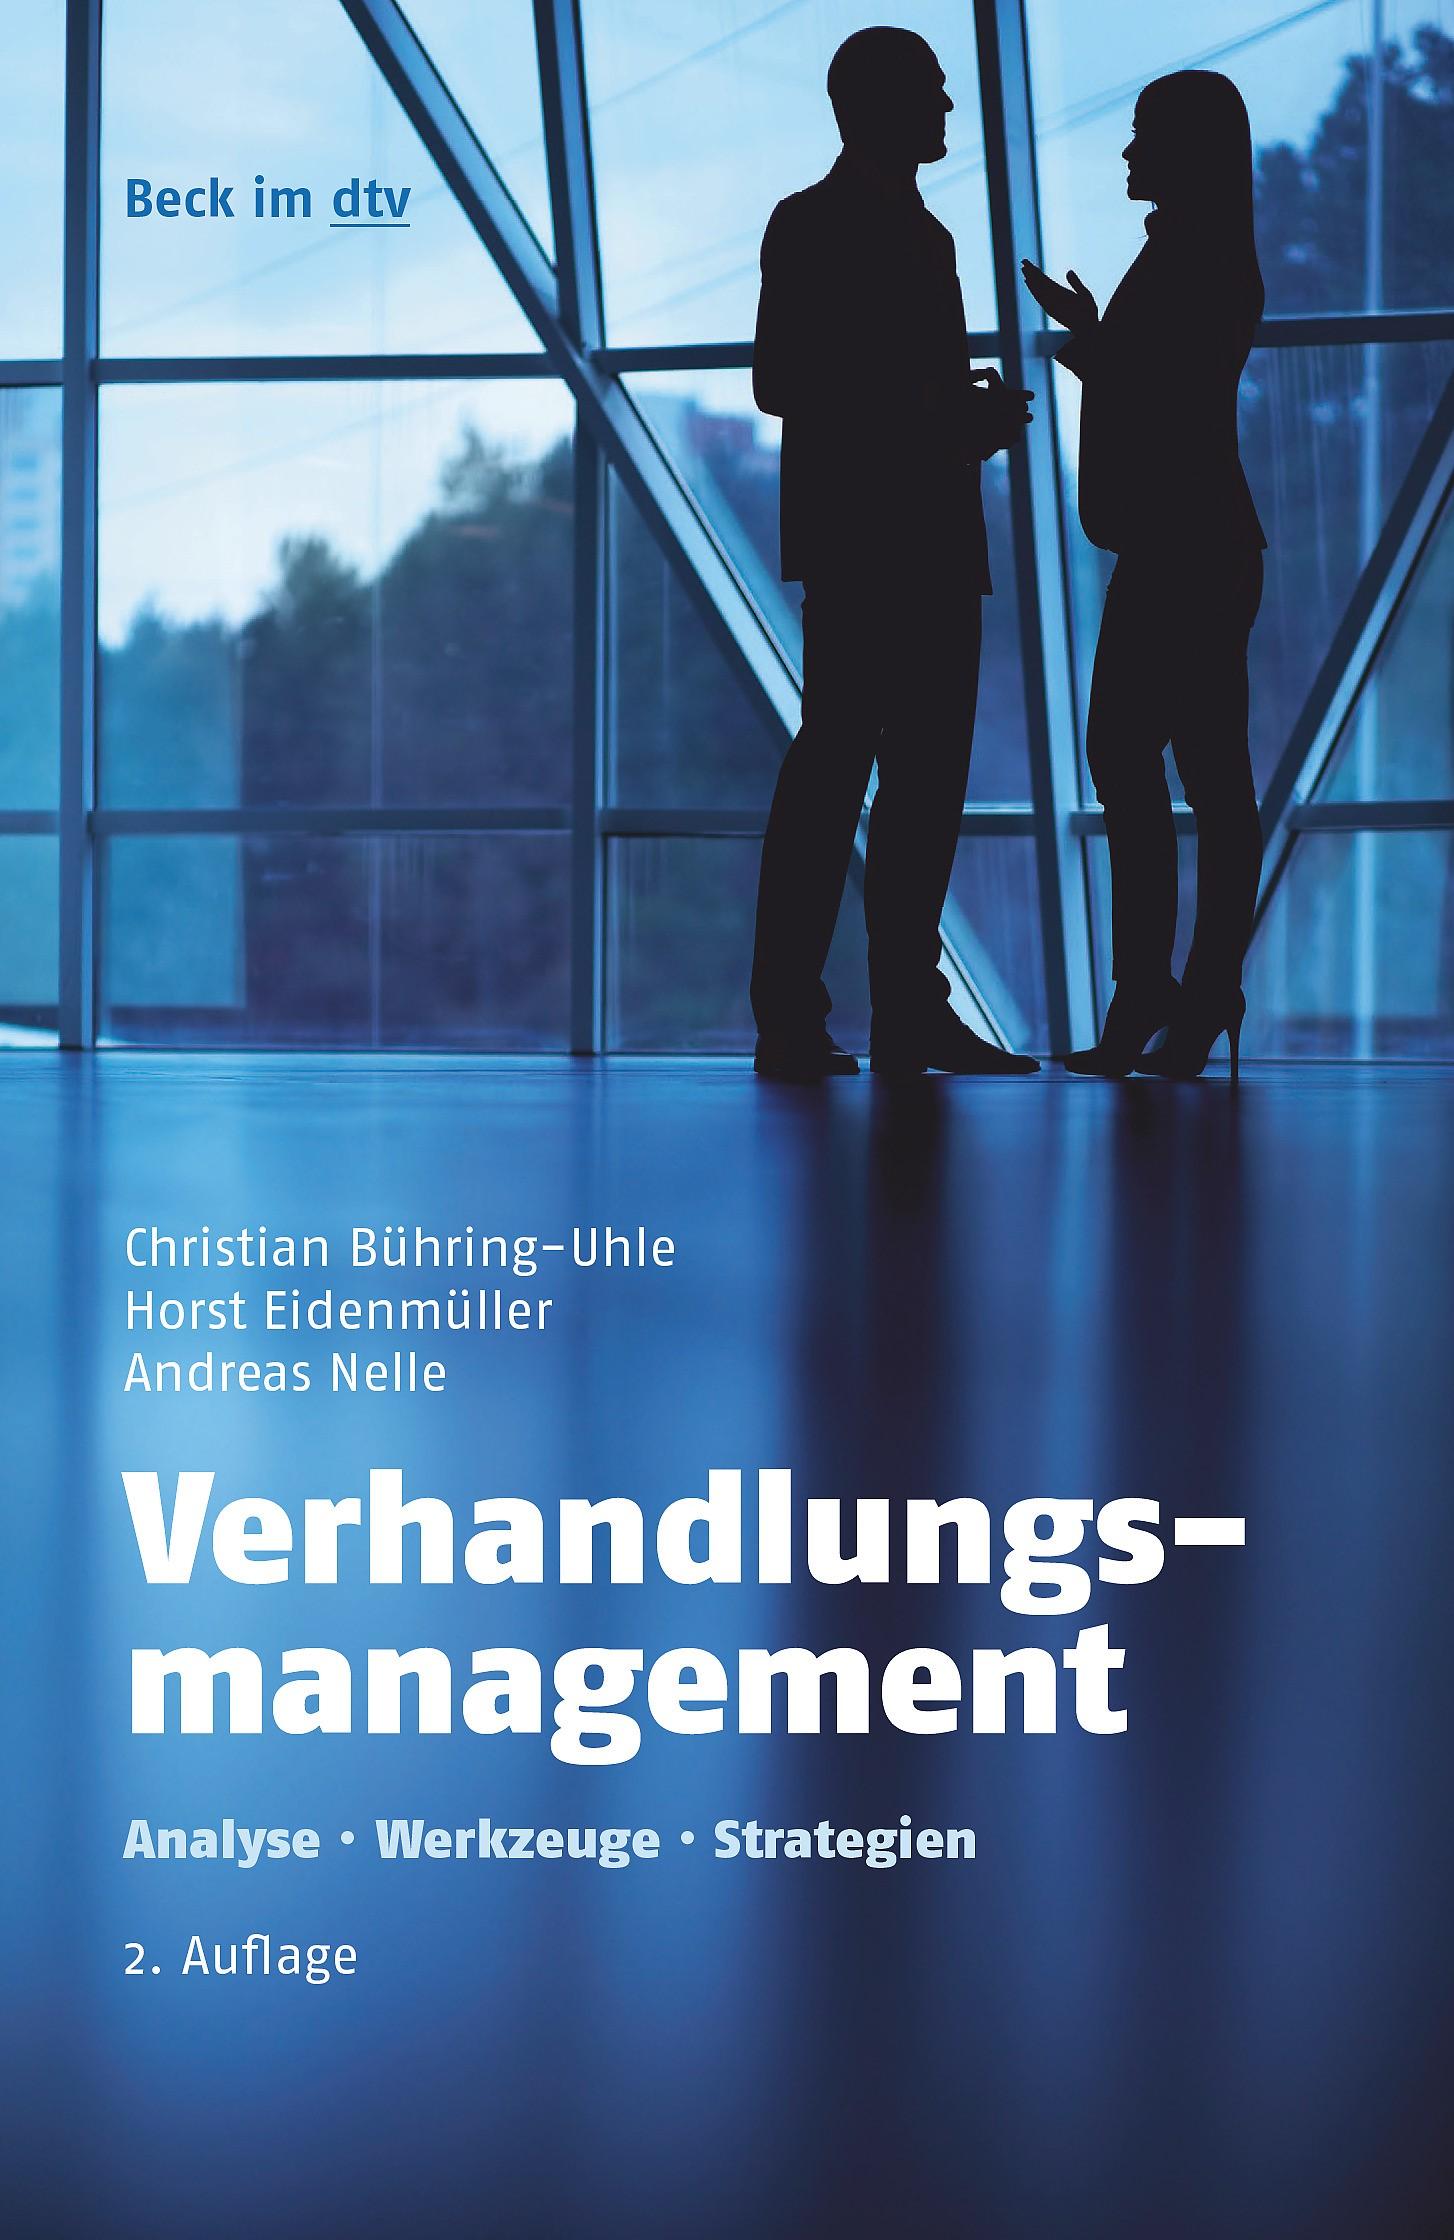 Verhandlungsmanagement | Bühring-Uhle / Eidenmüller / Nelle | 2. Auflage, 2017 | Buch (Cover)